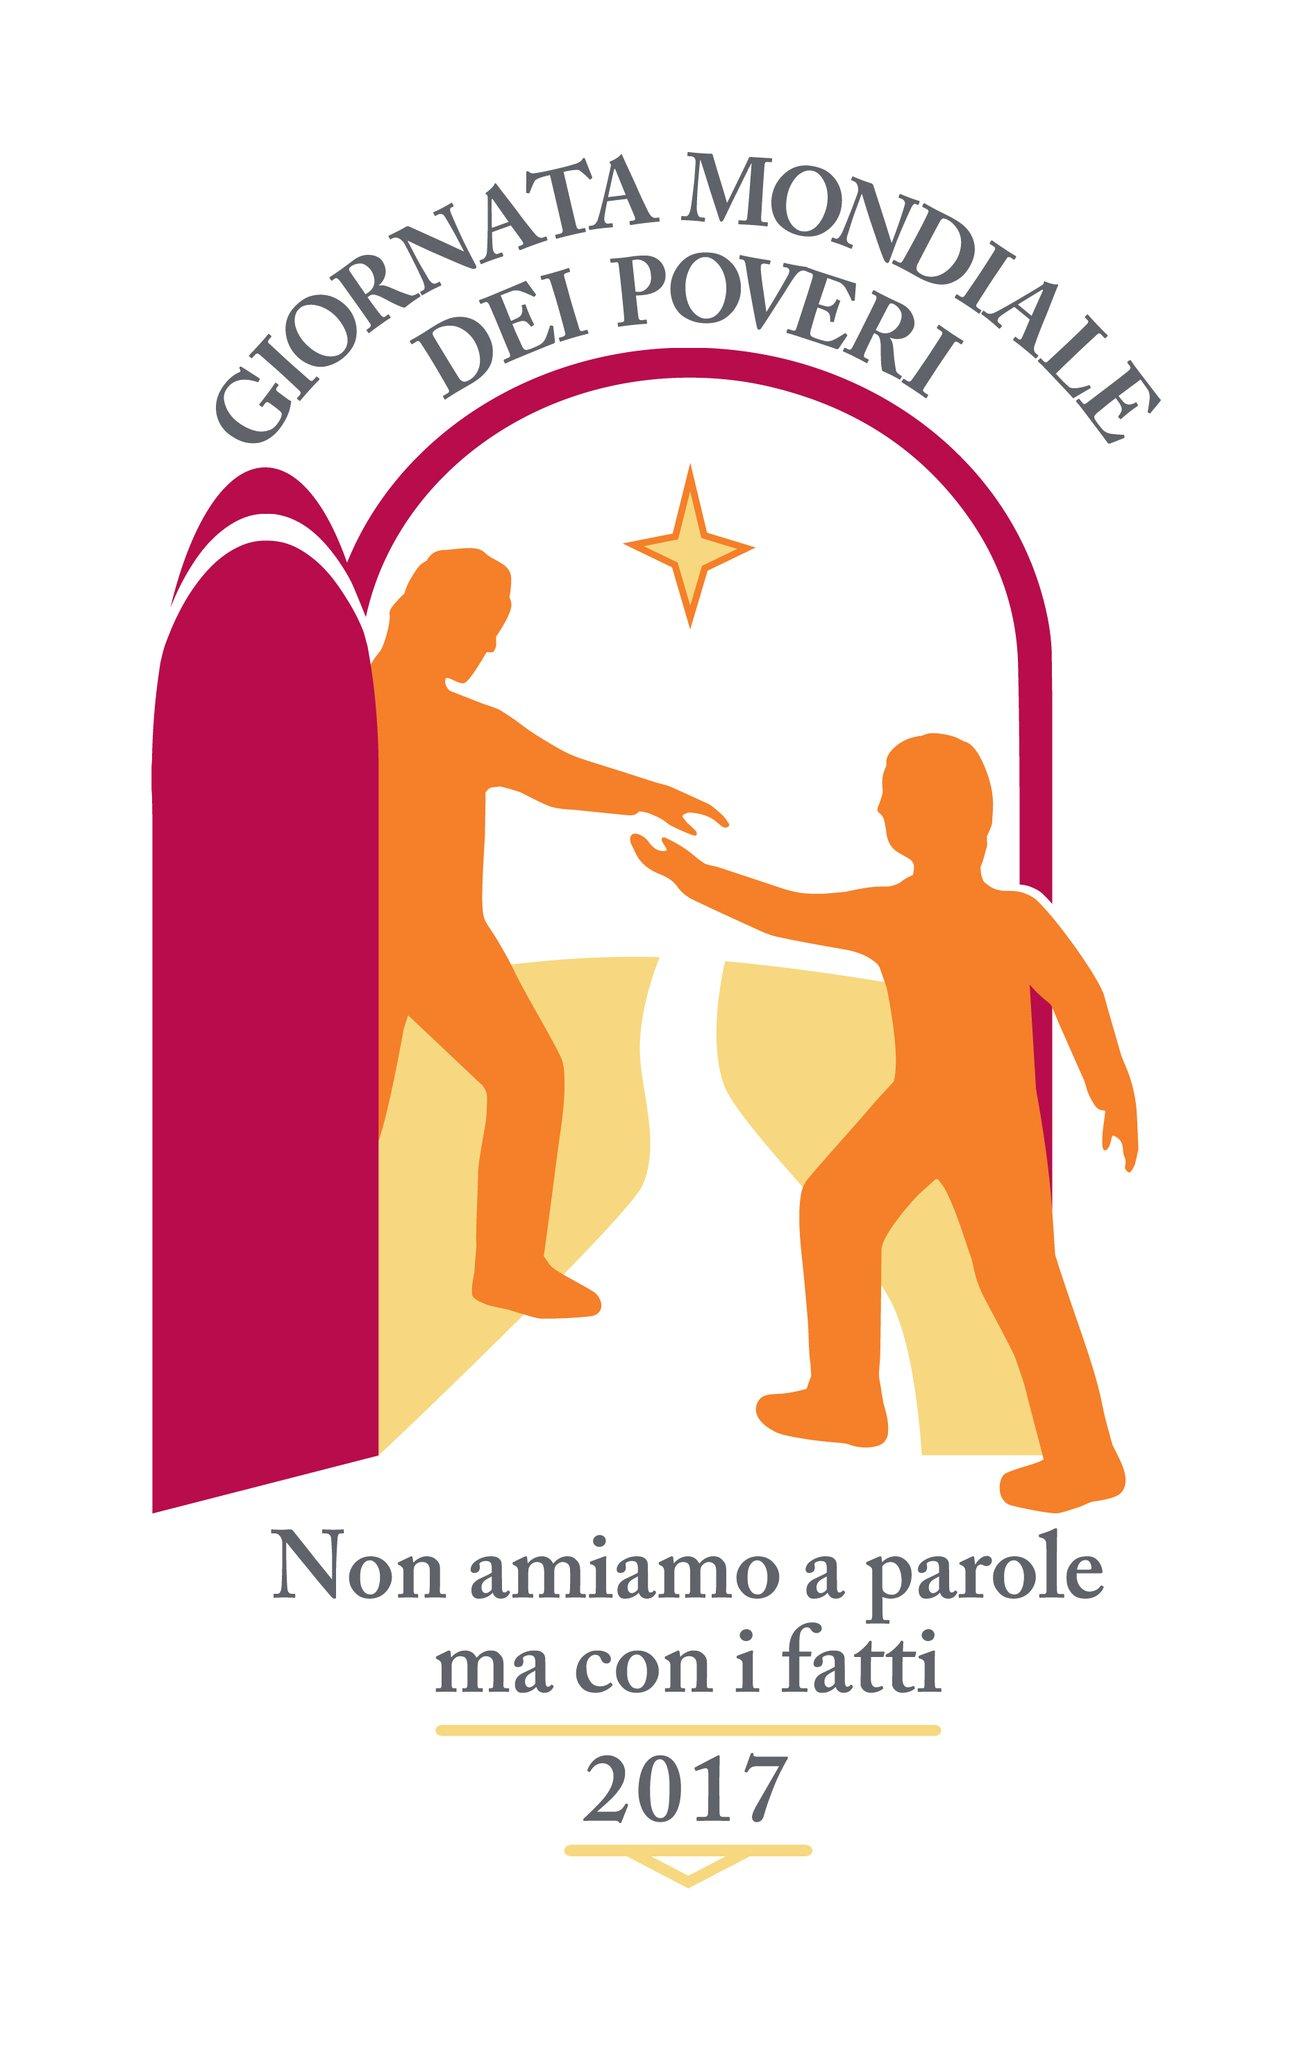 Avvisi 12 novembre 2017 parrocchia di san marco udine for Casa moderna udine 2017 orari